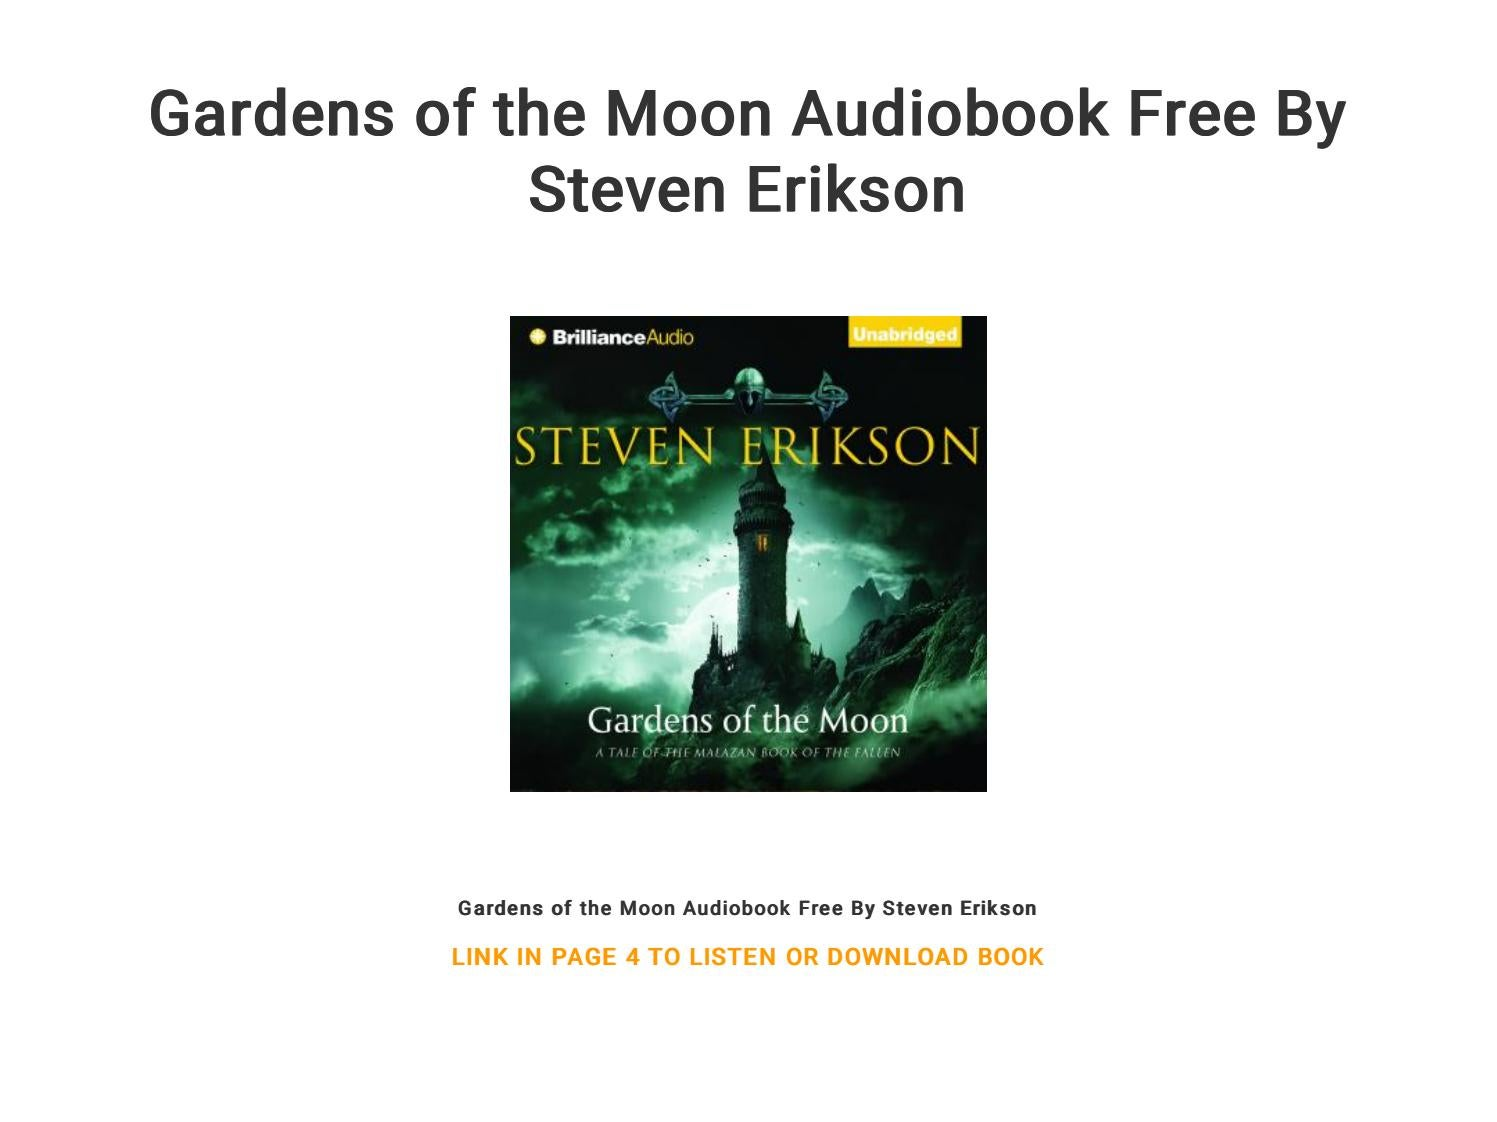 steven erikson audiobook